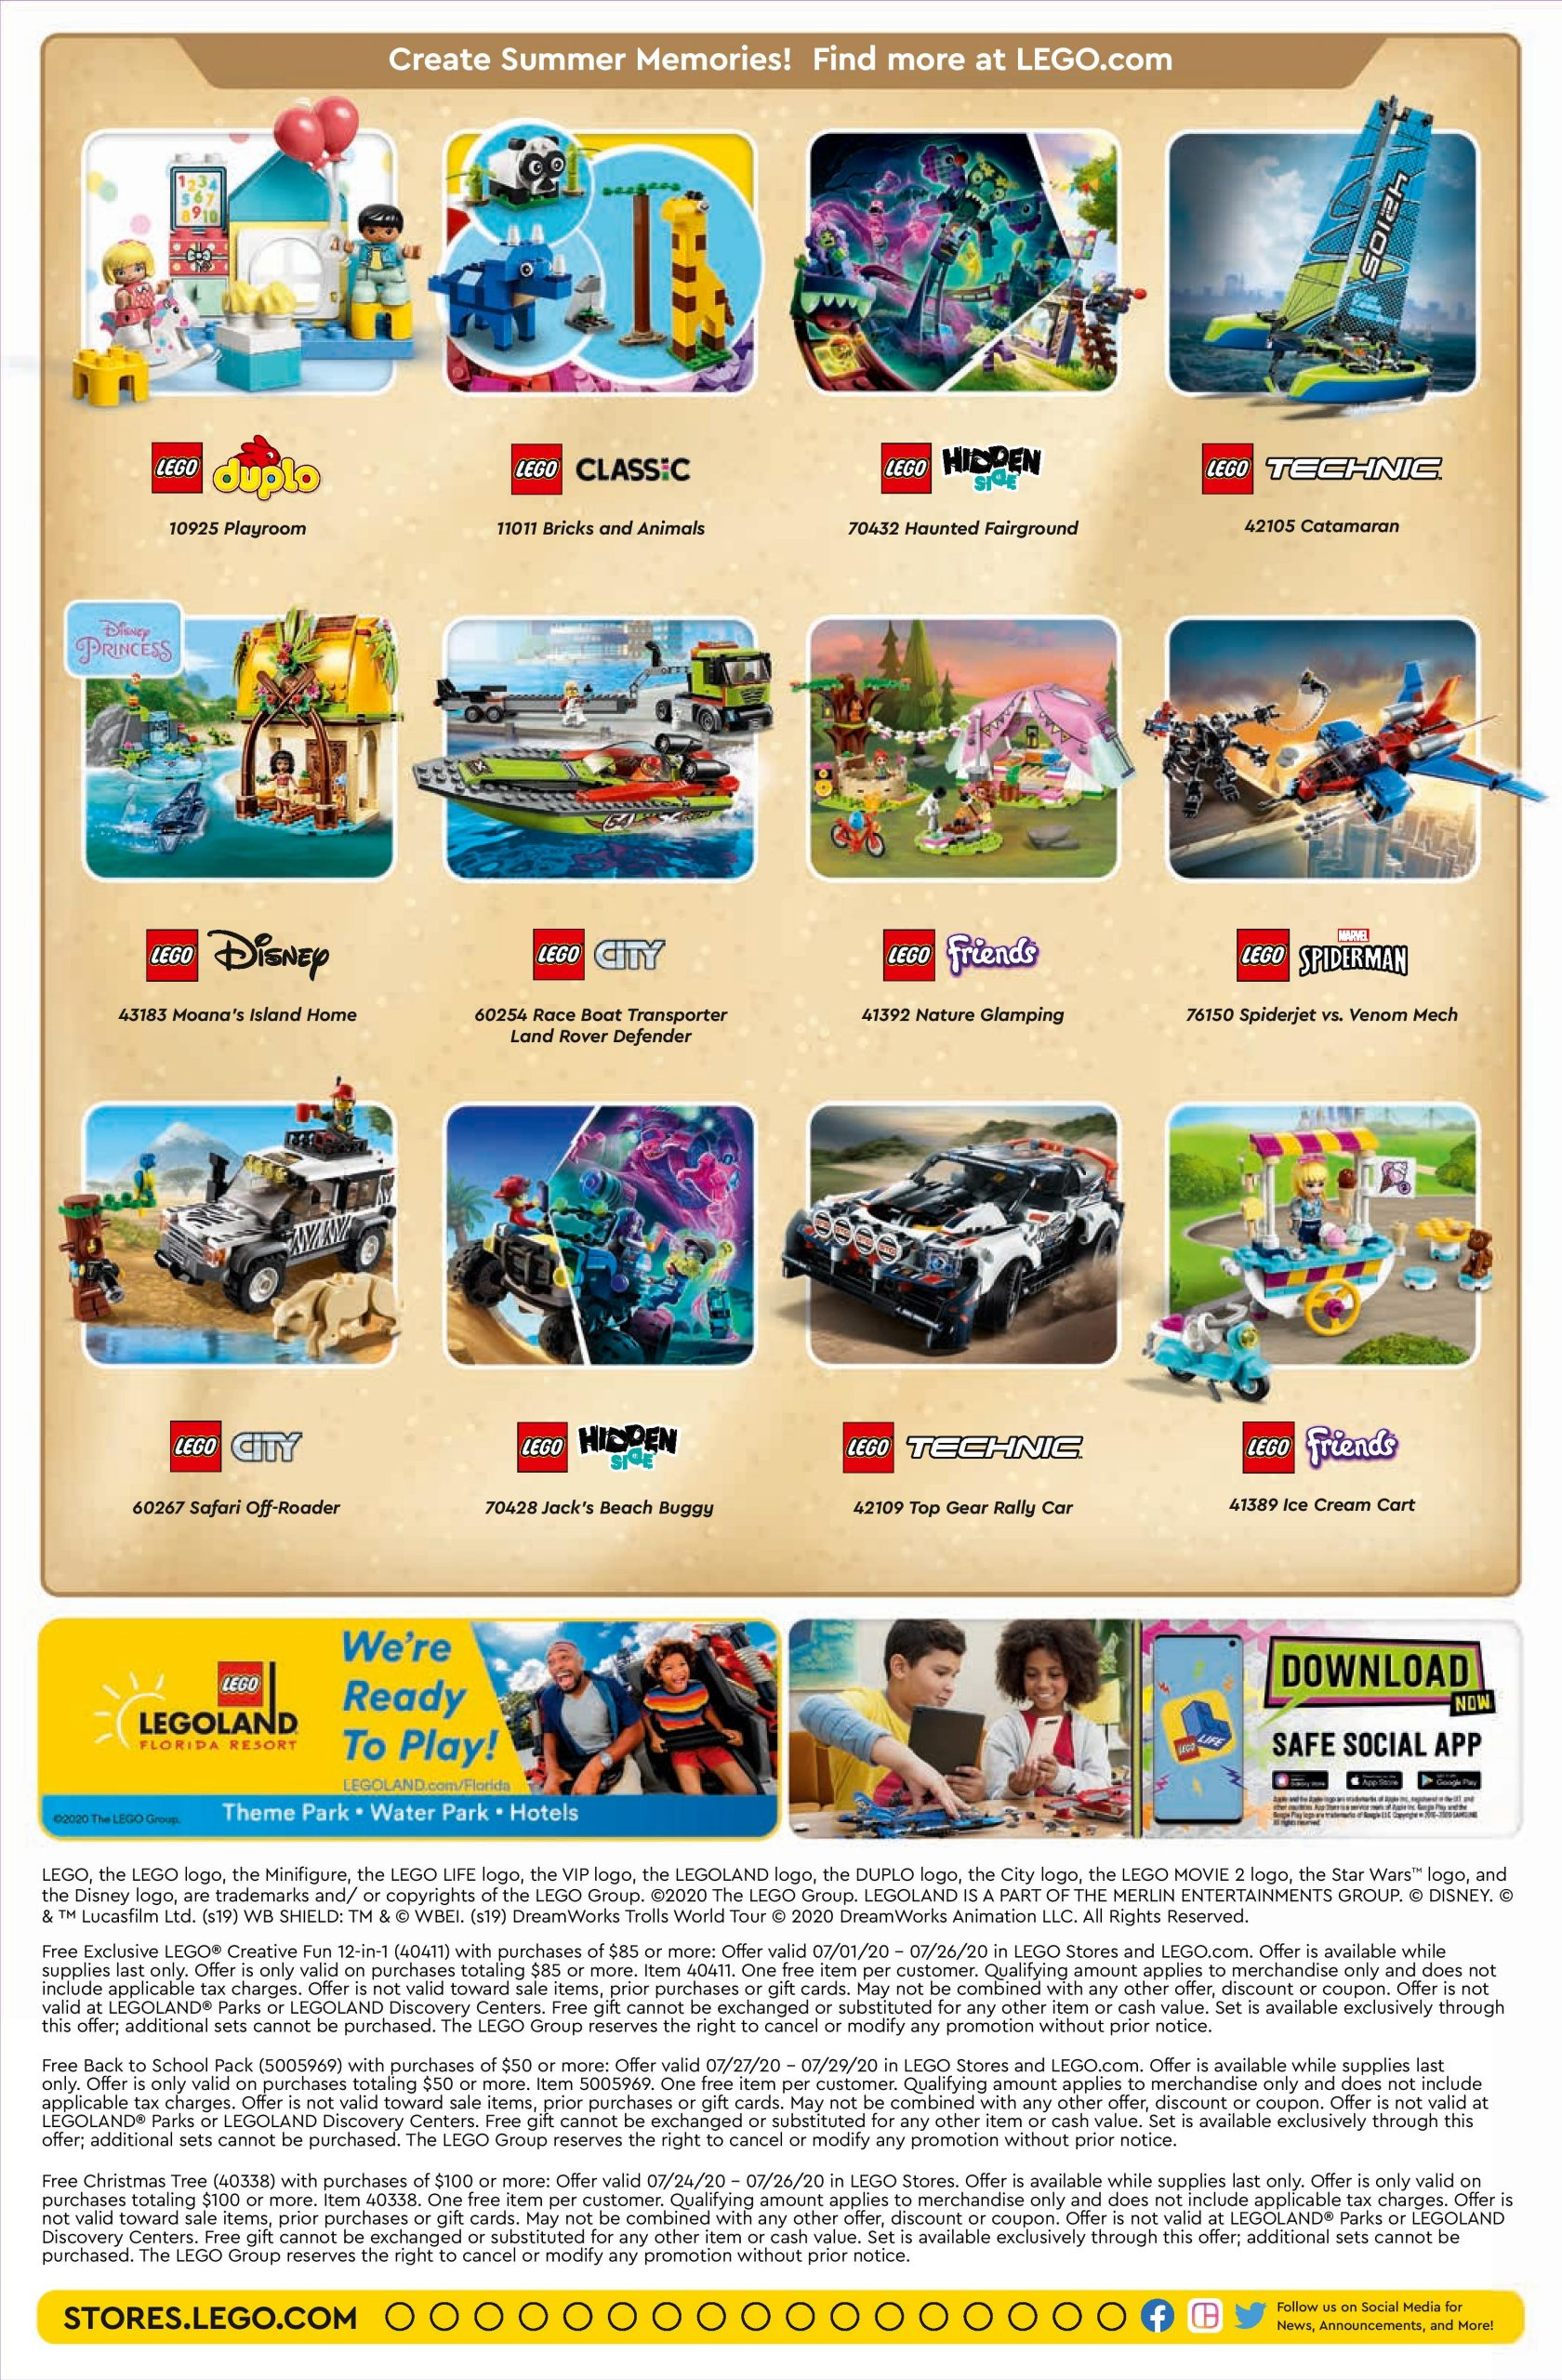 Lego June 2021 Calendar LEGO July 2020 Store Calendar Promotions & Events   The Brick Fan